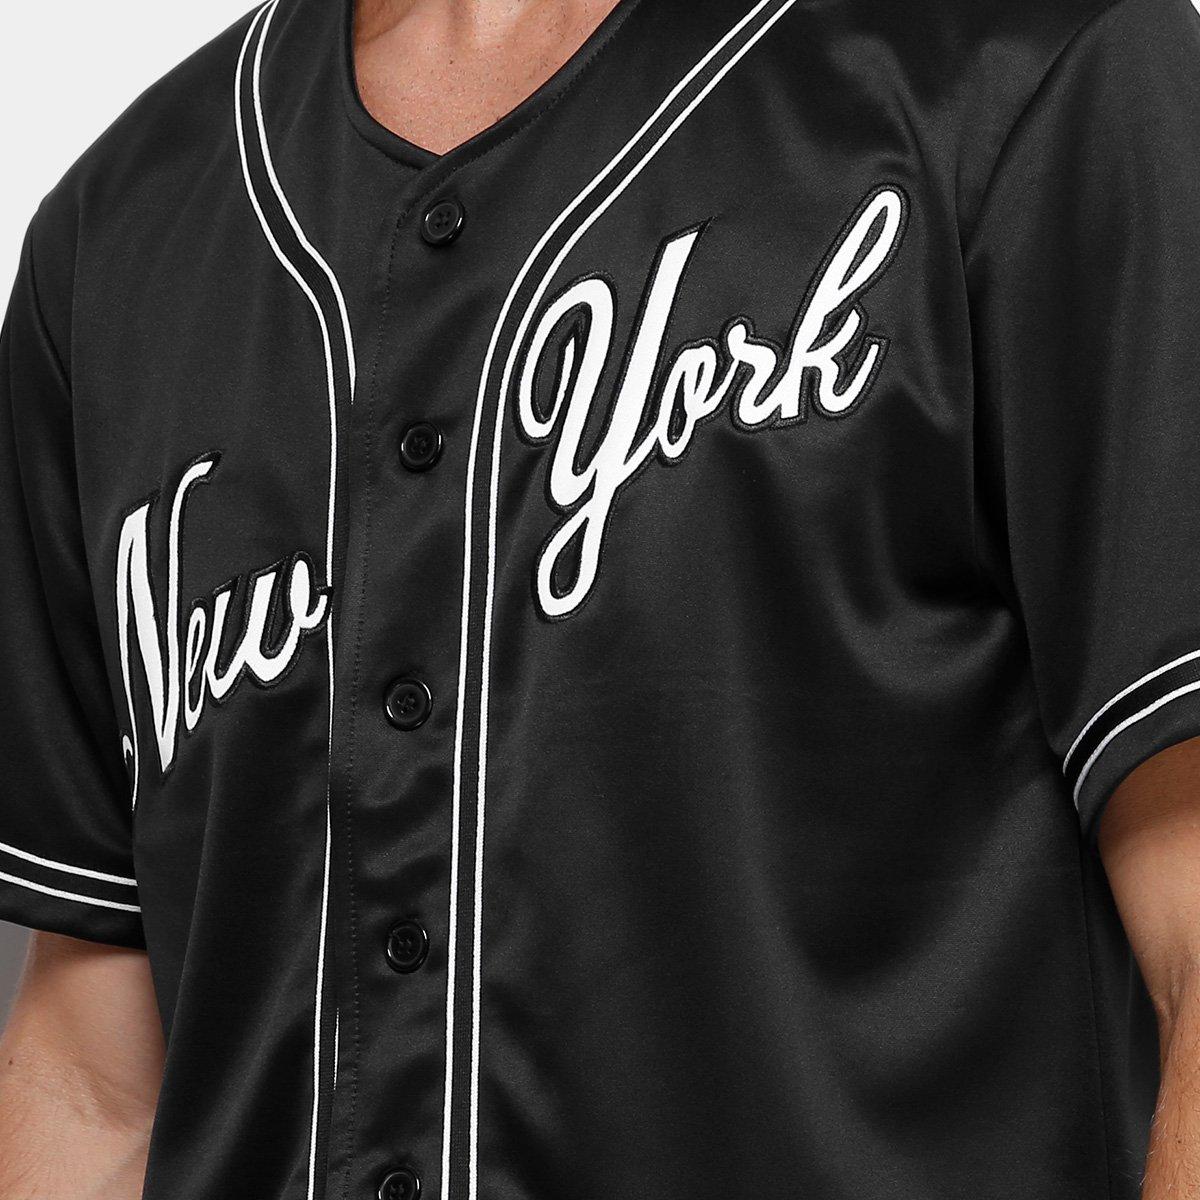 61bbb8823e Camisa Baseball Kappa New York Raglan 17 Masculina - Preto - Compre ...